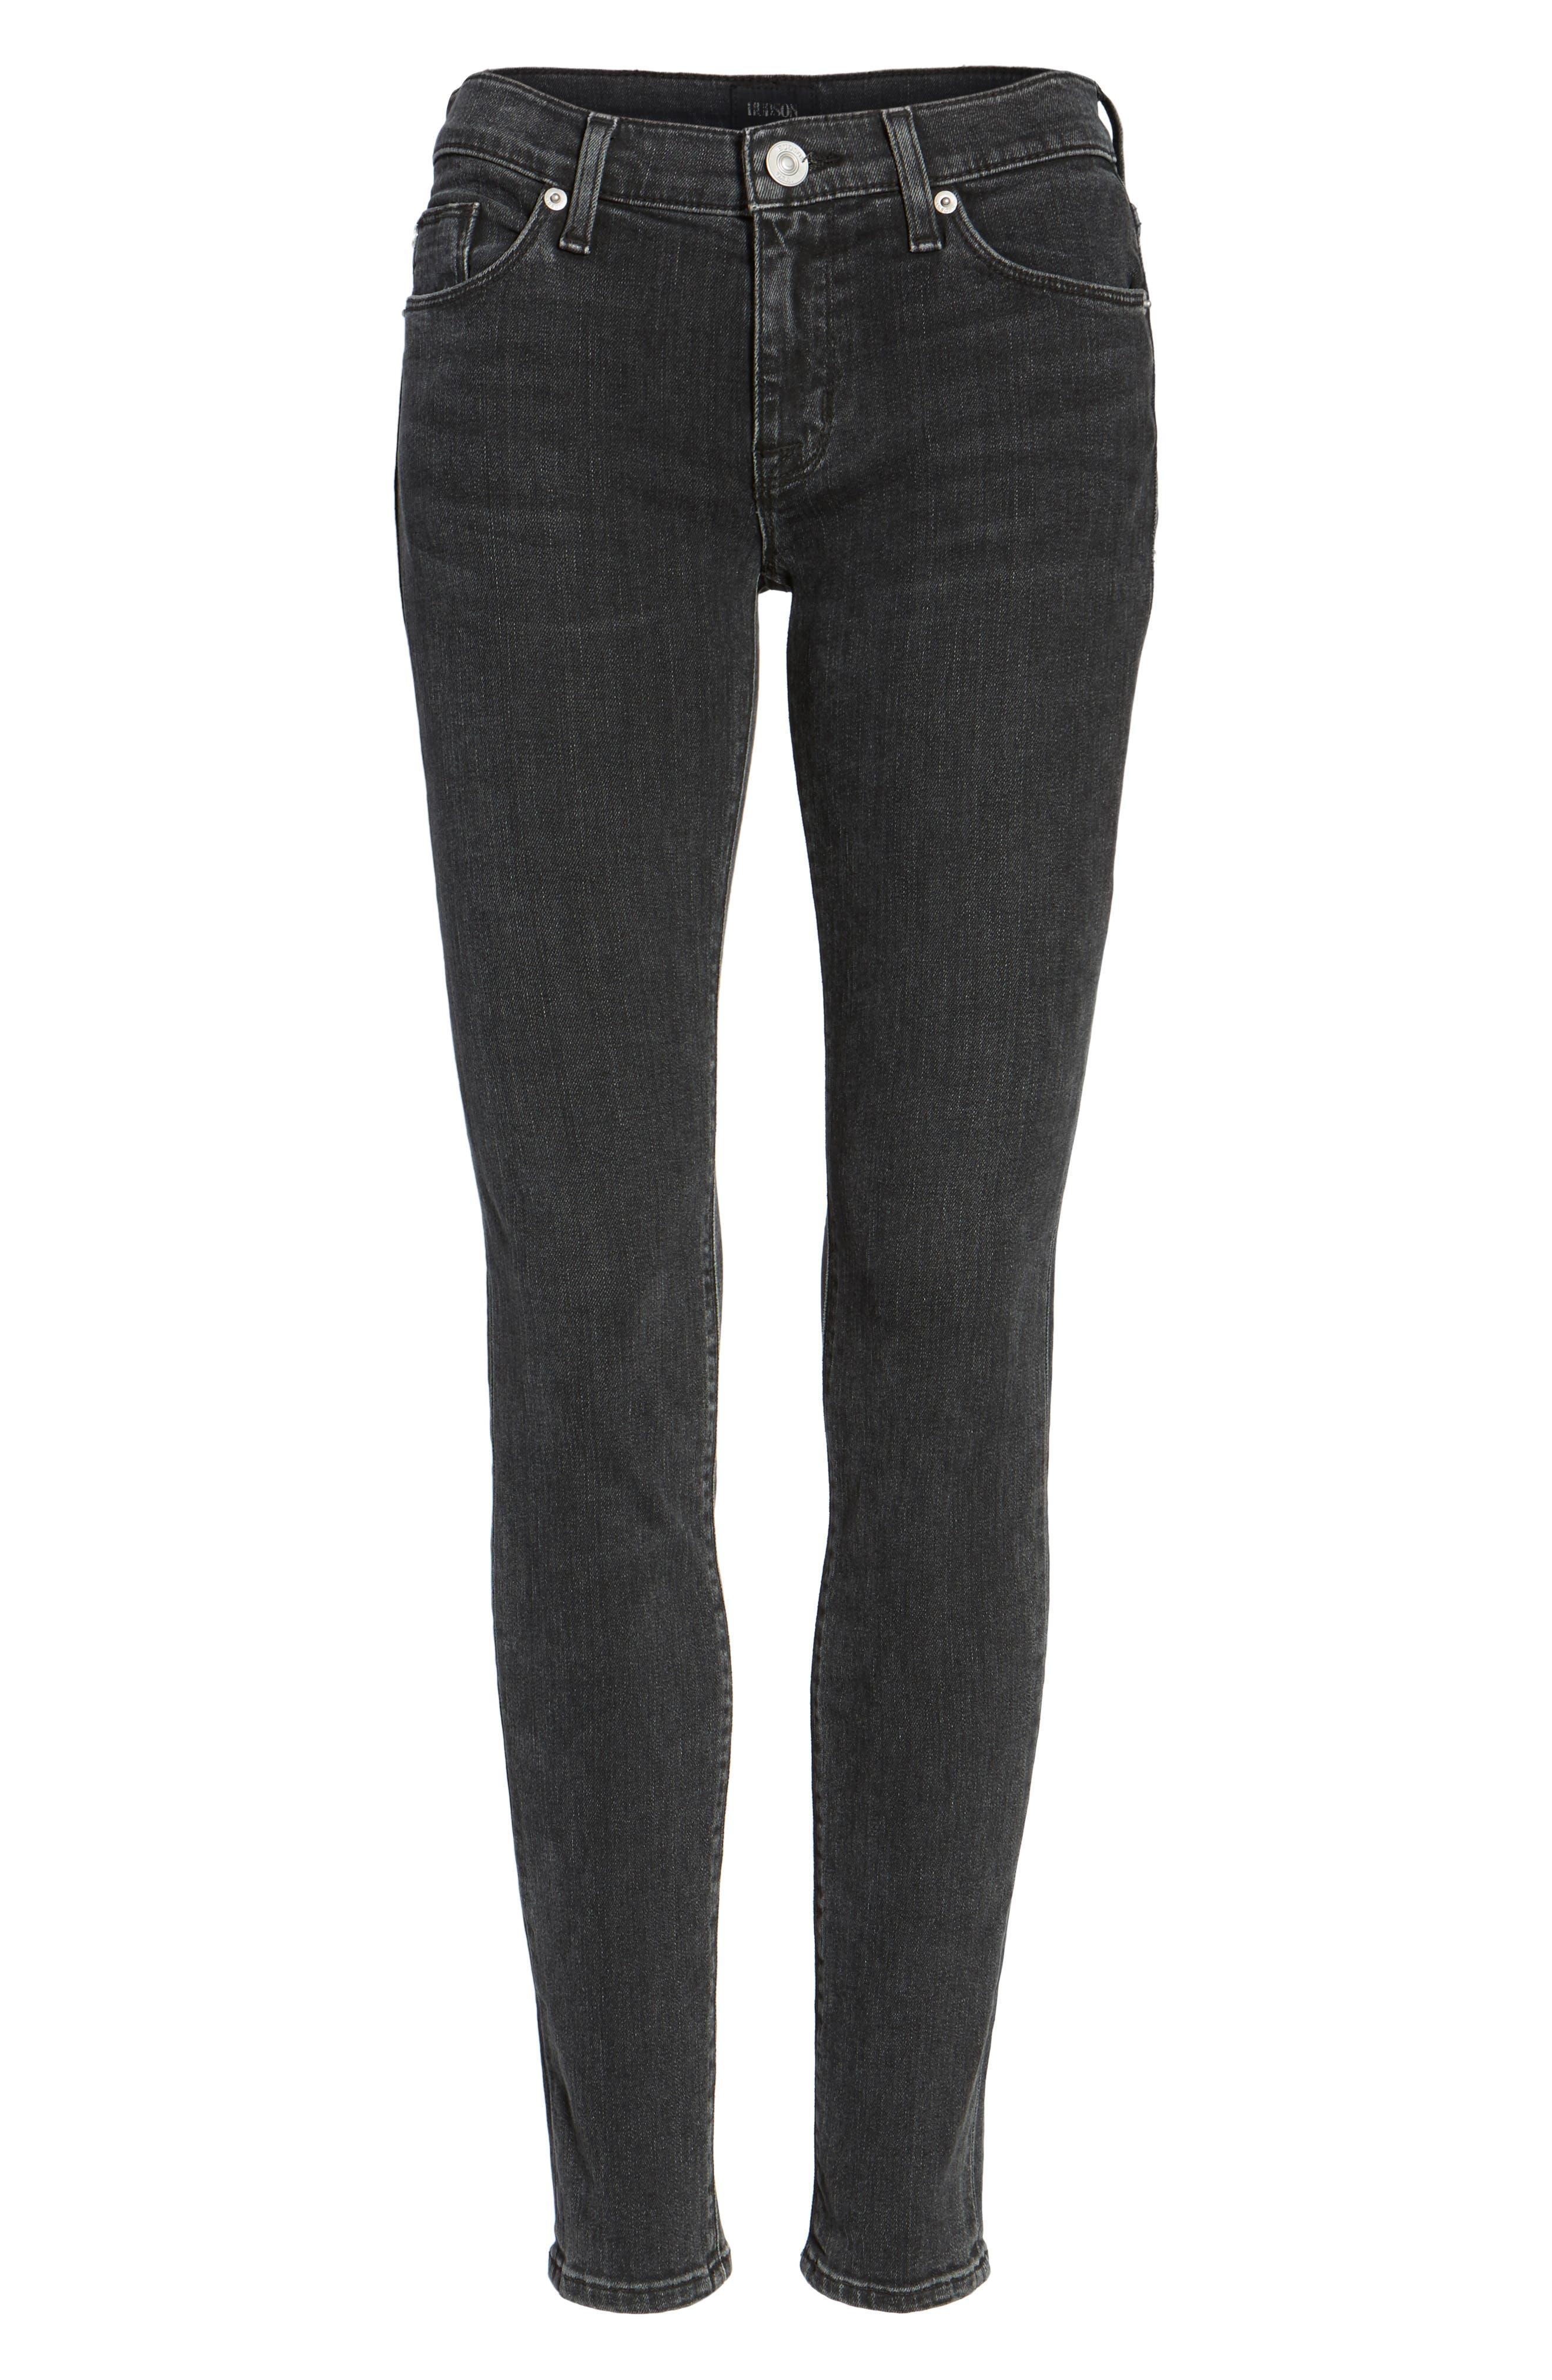 Krista Super Skinny Jeans,                             Alternate thumbnail 6, color,                             8Bit